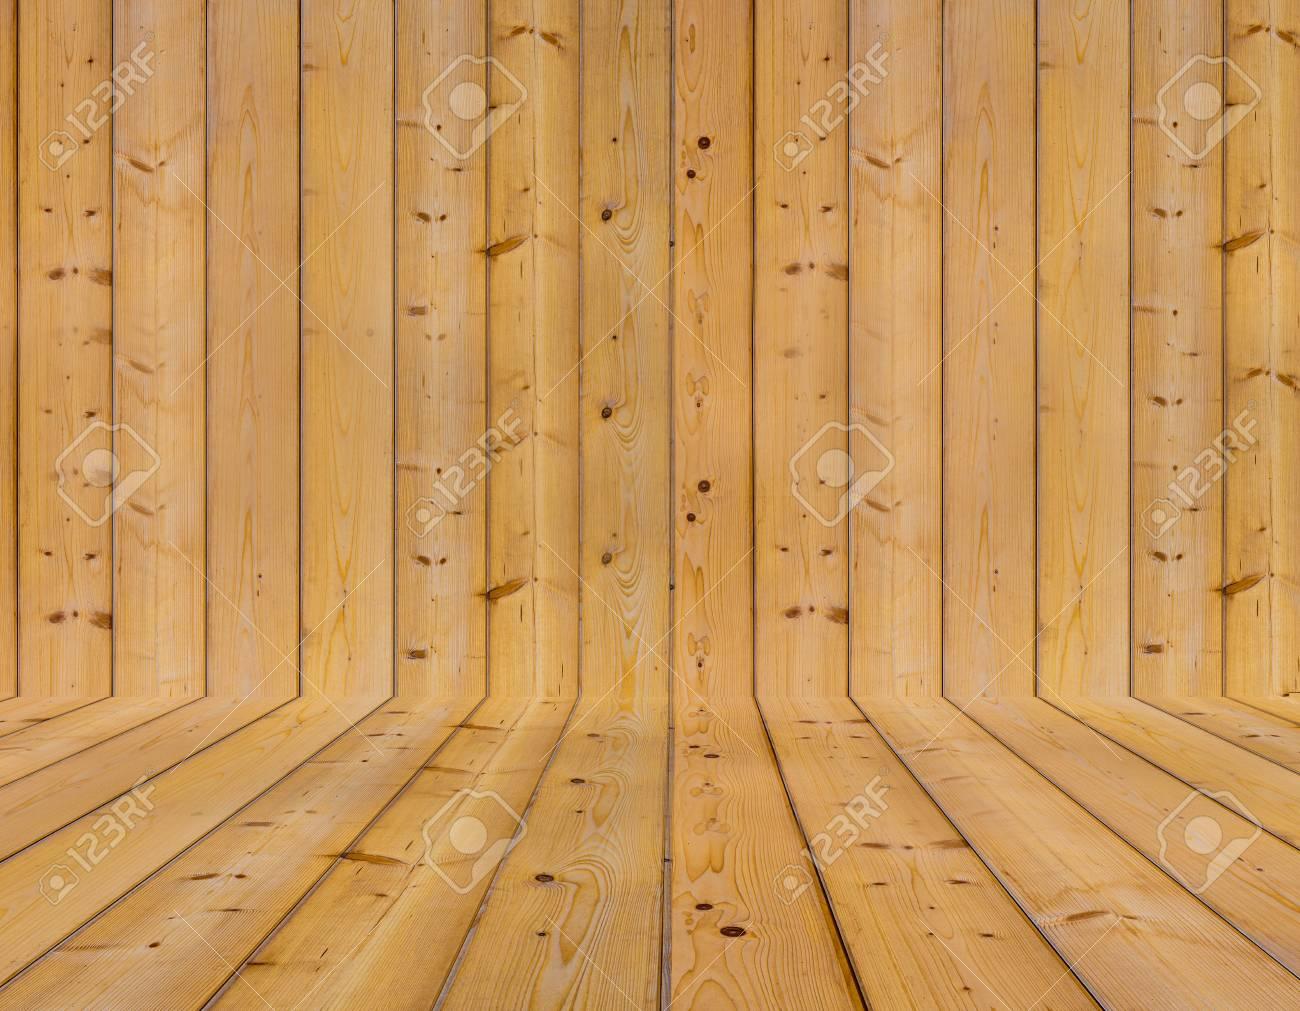 wood texture  interior background panels Stock Photo - 23910707